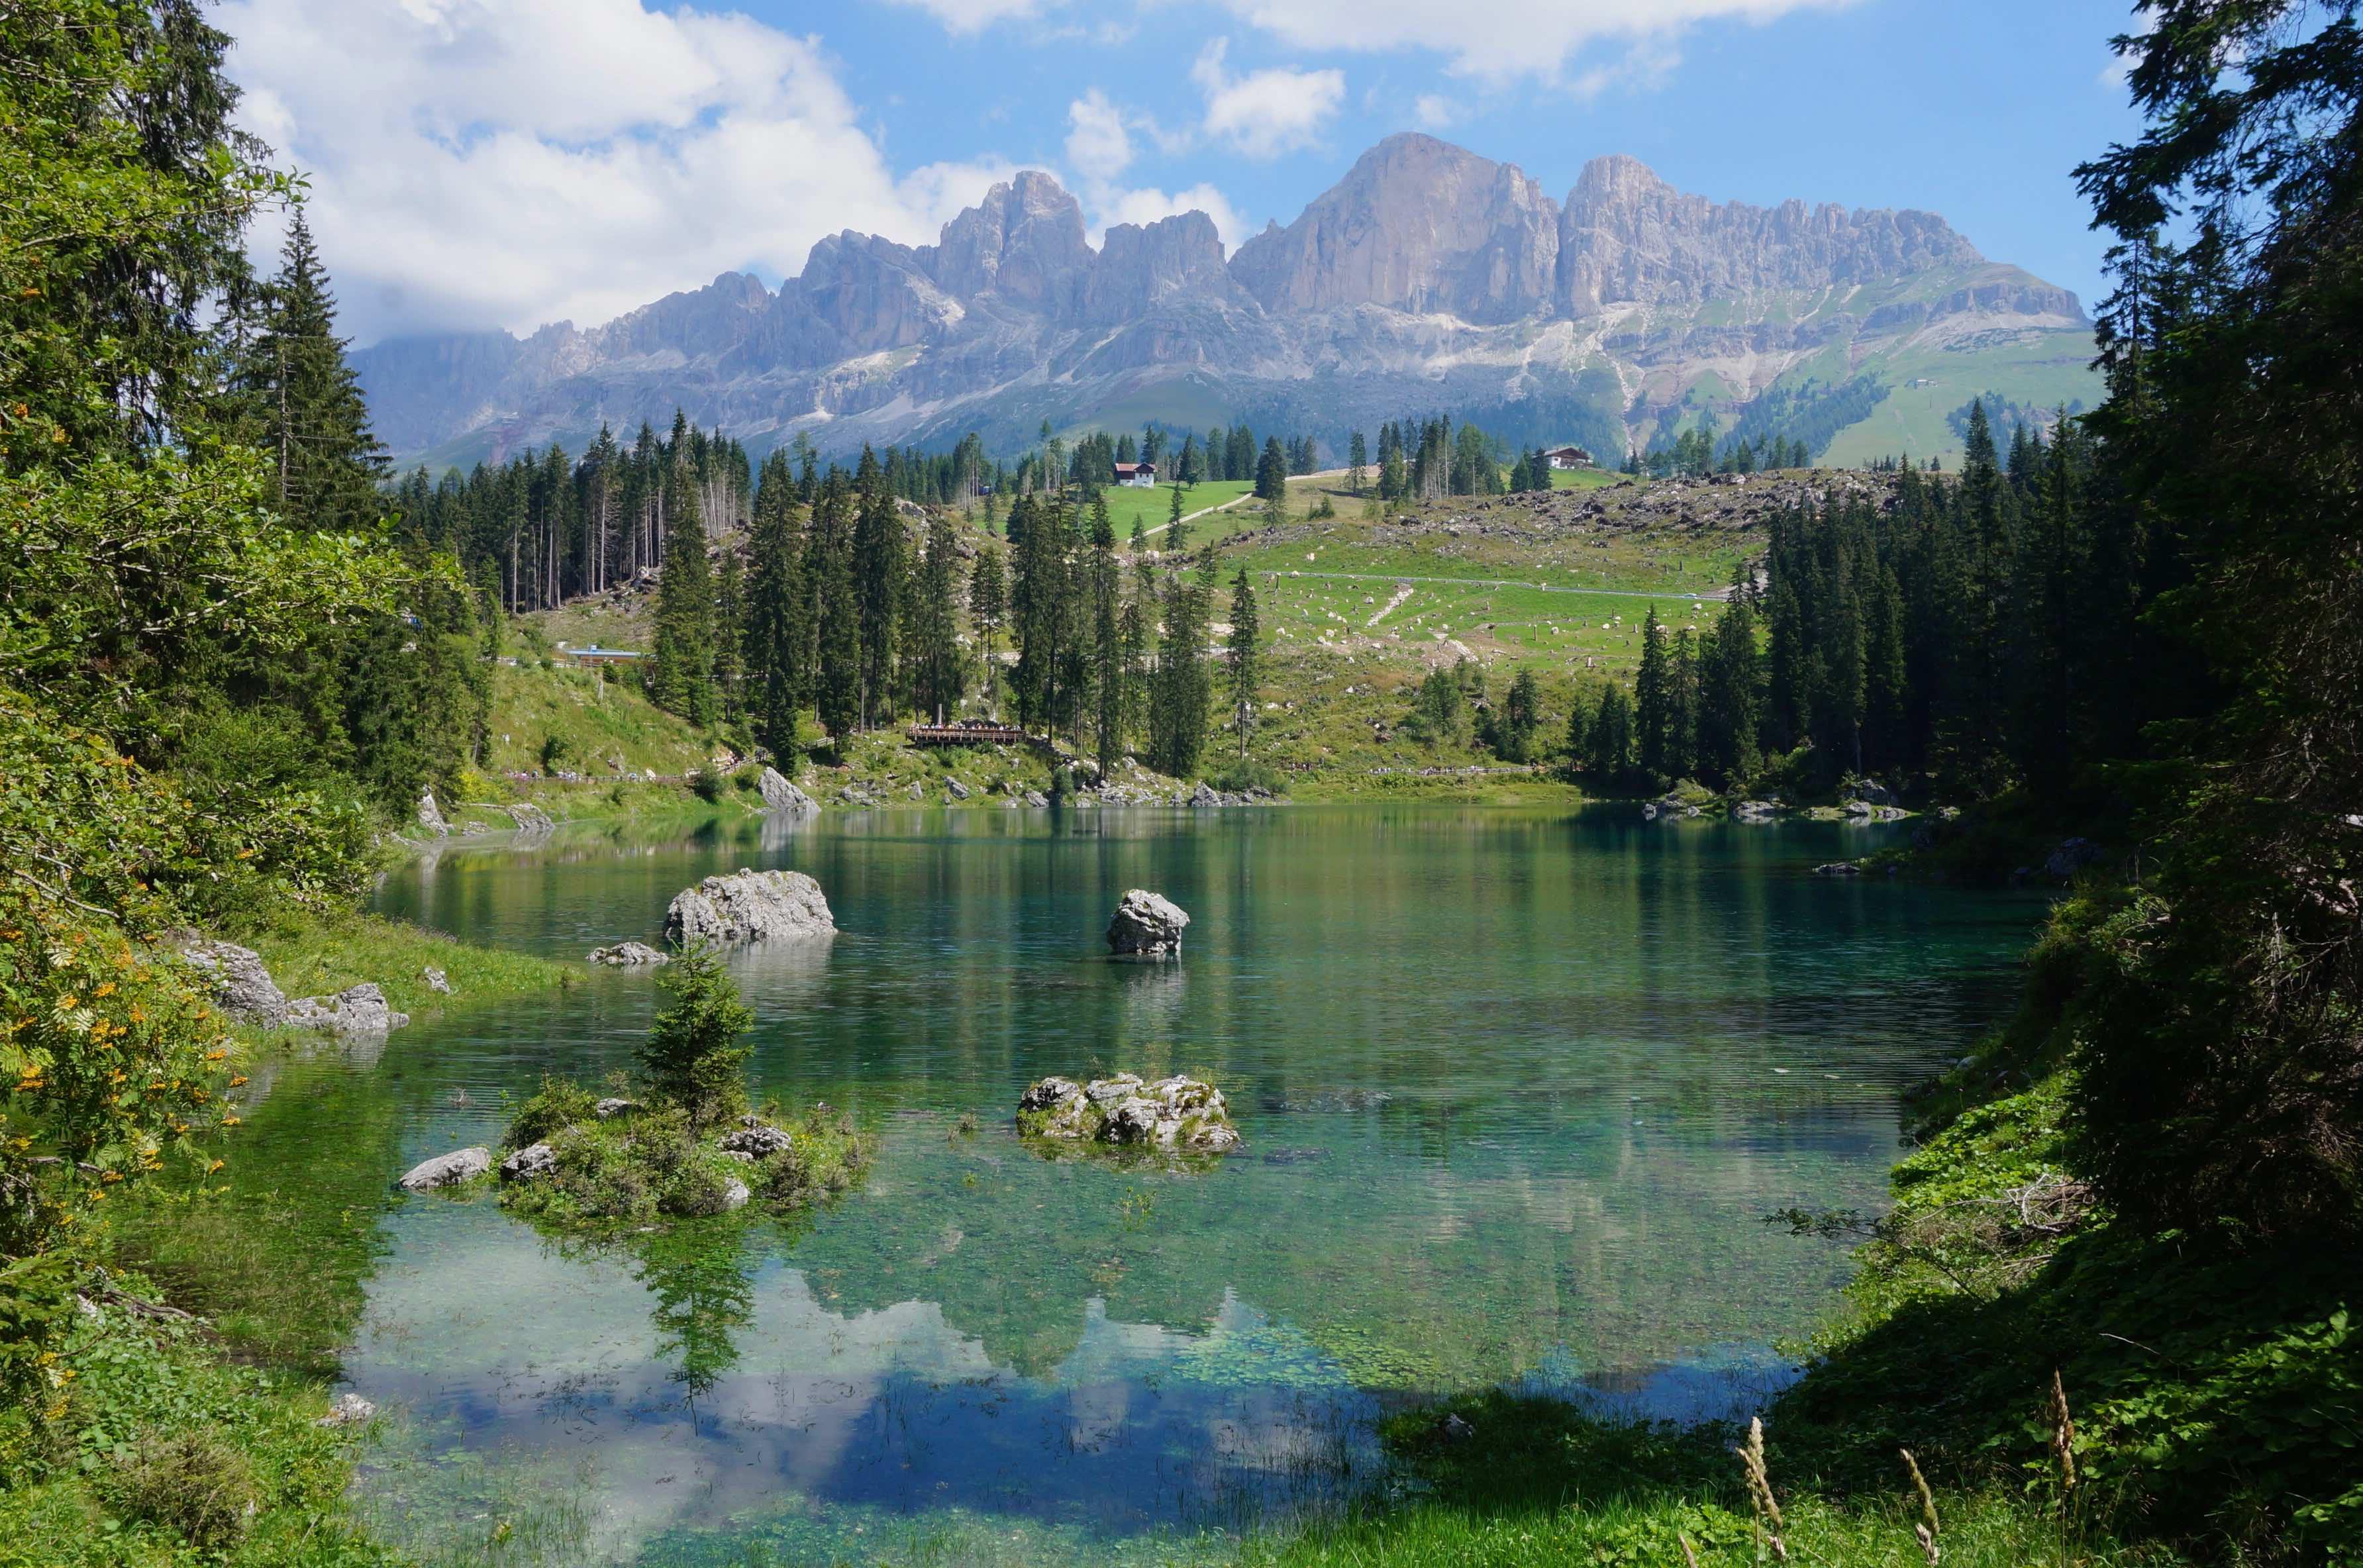 lago di carezza, dolomites, italie